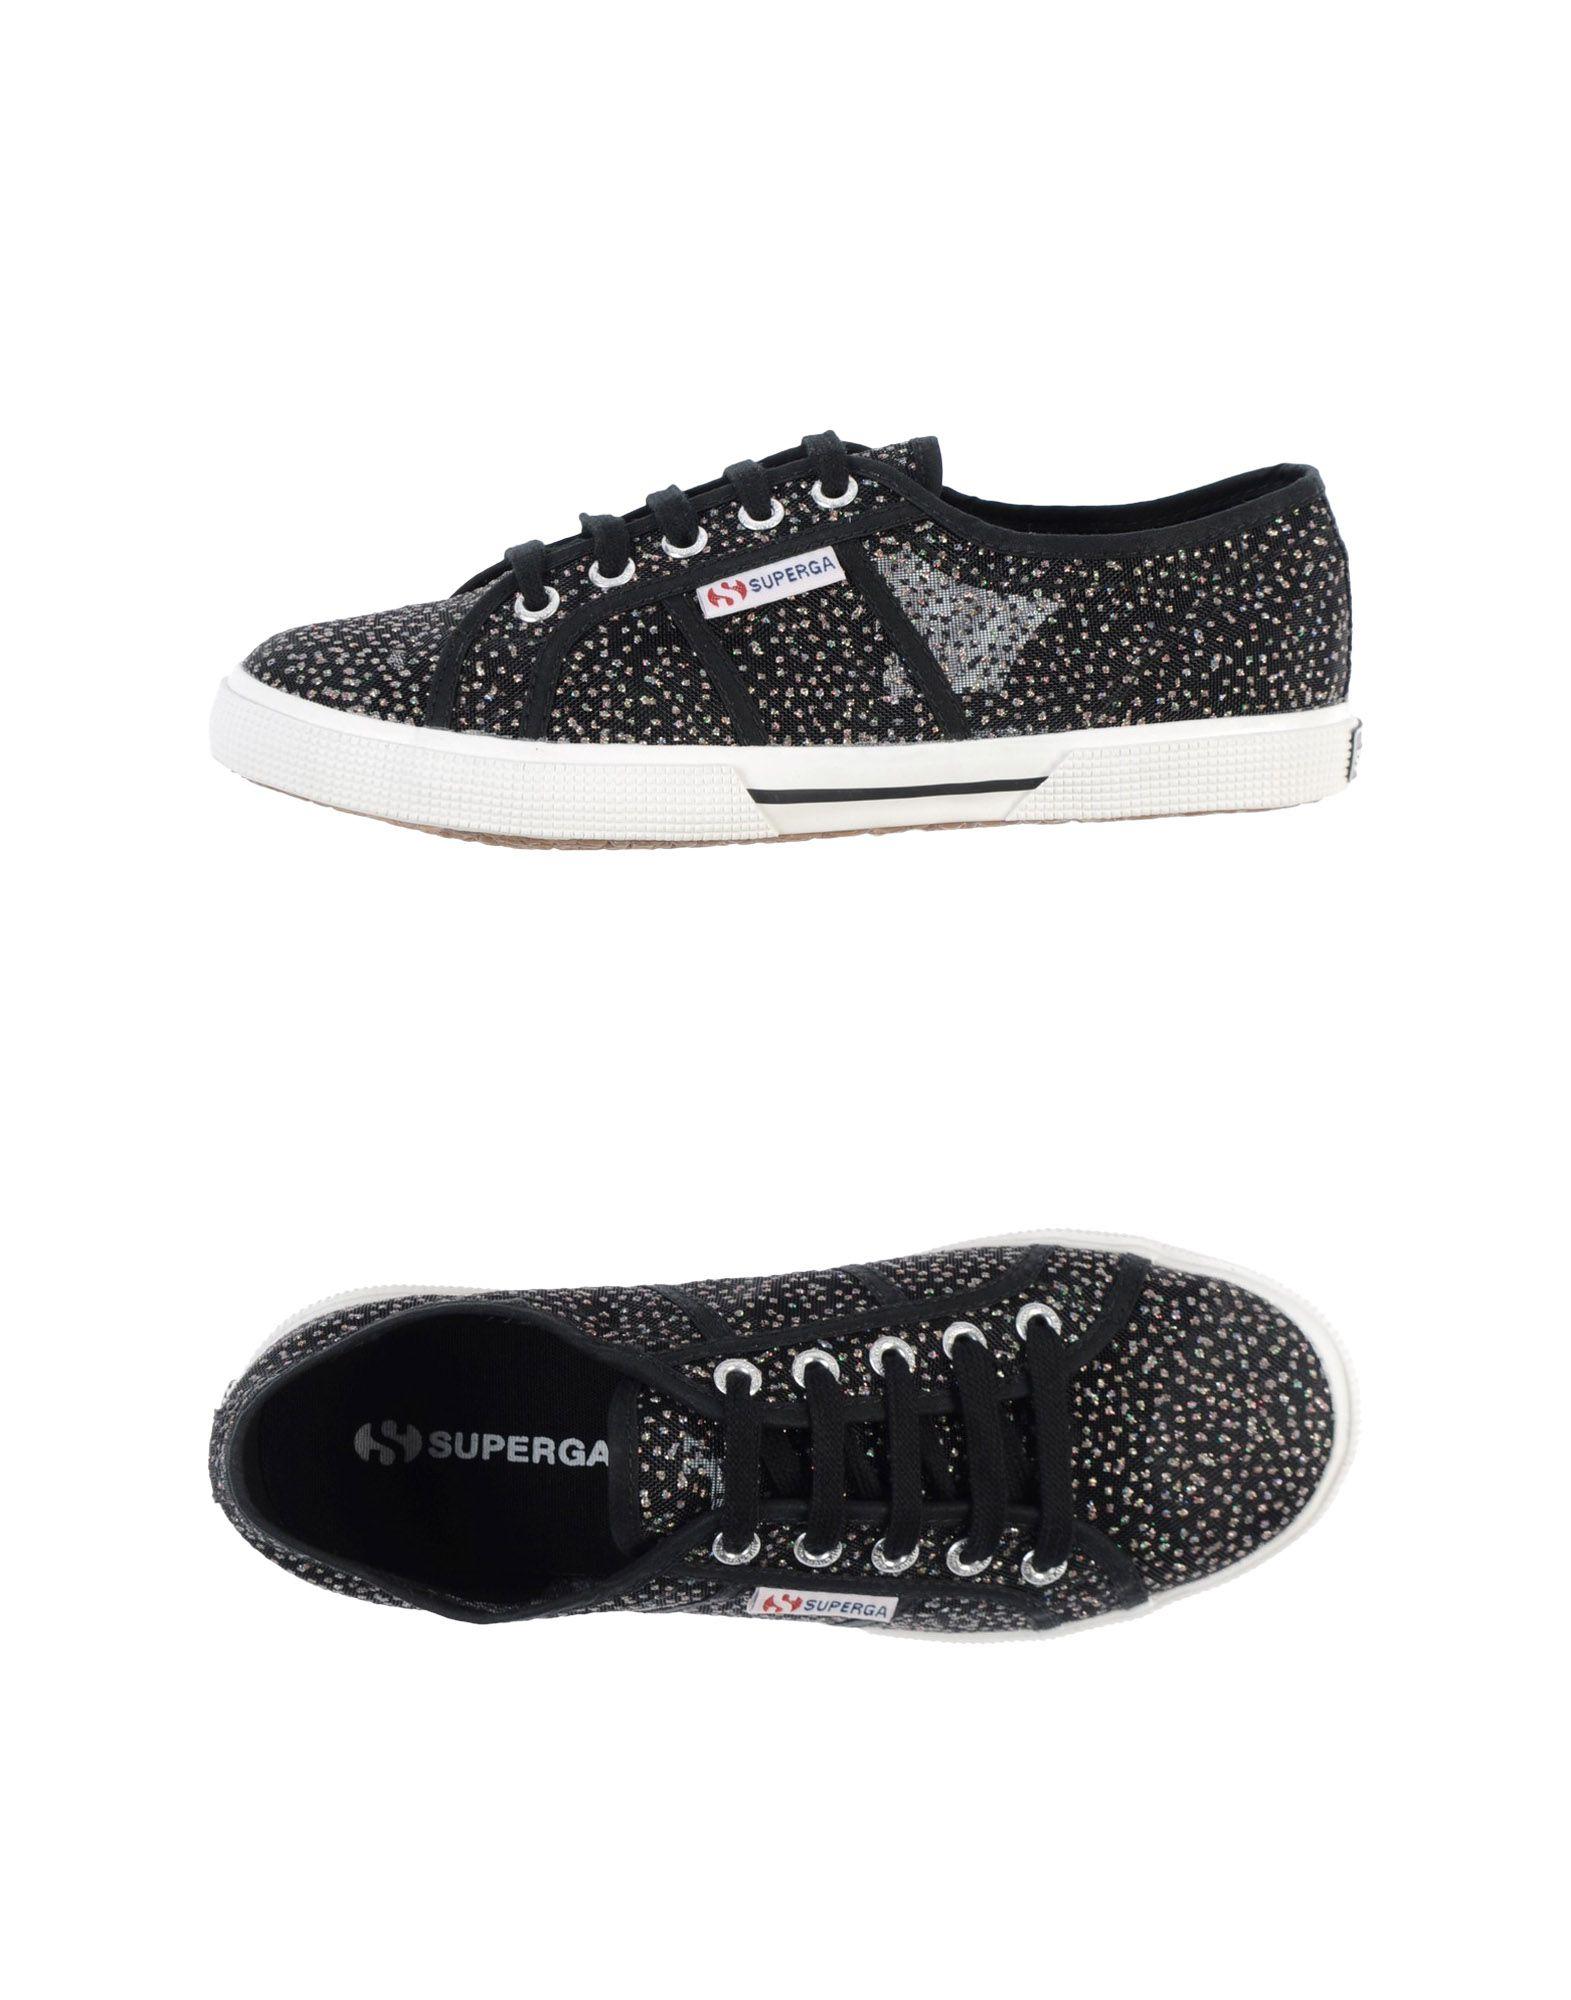 Superga: Superga Sneakers In Gray (Black)